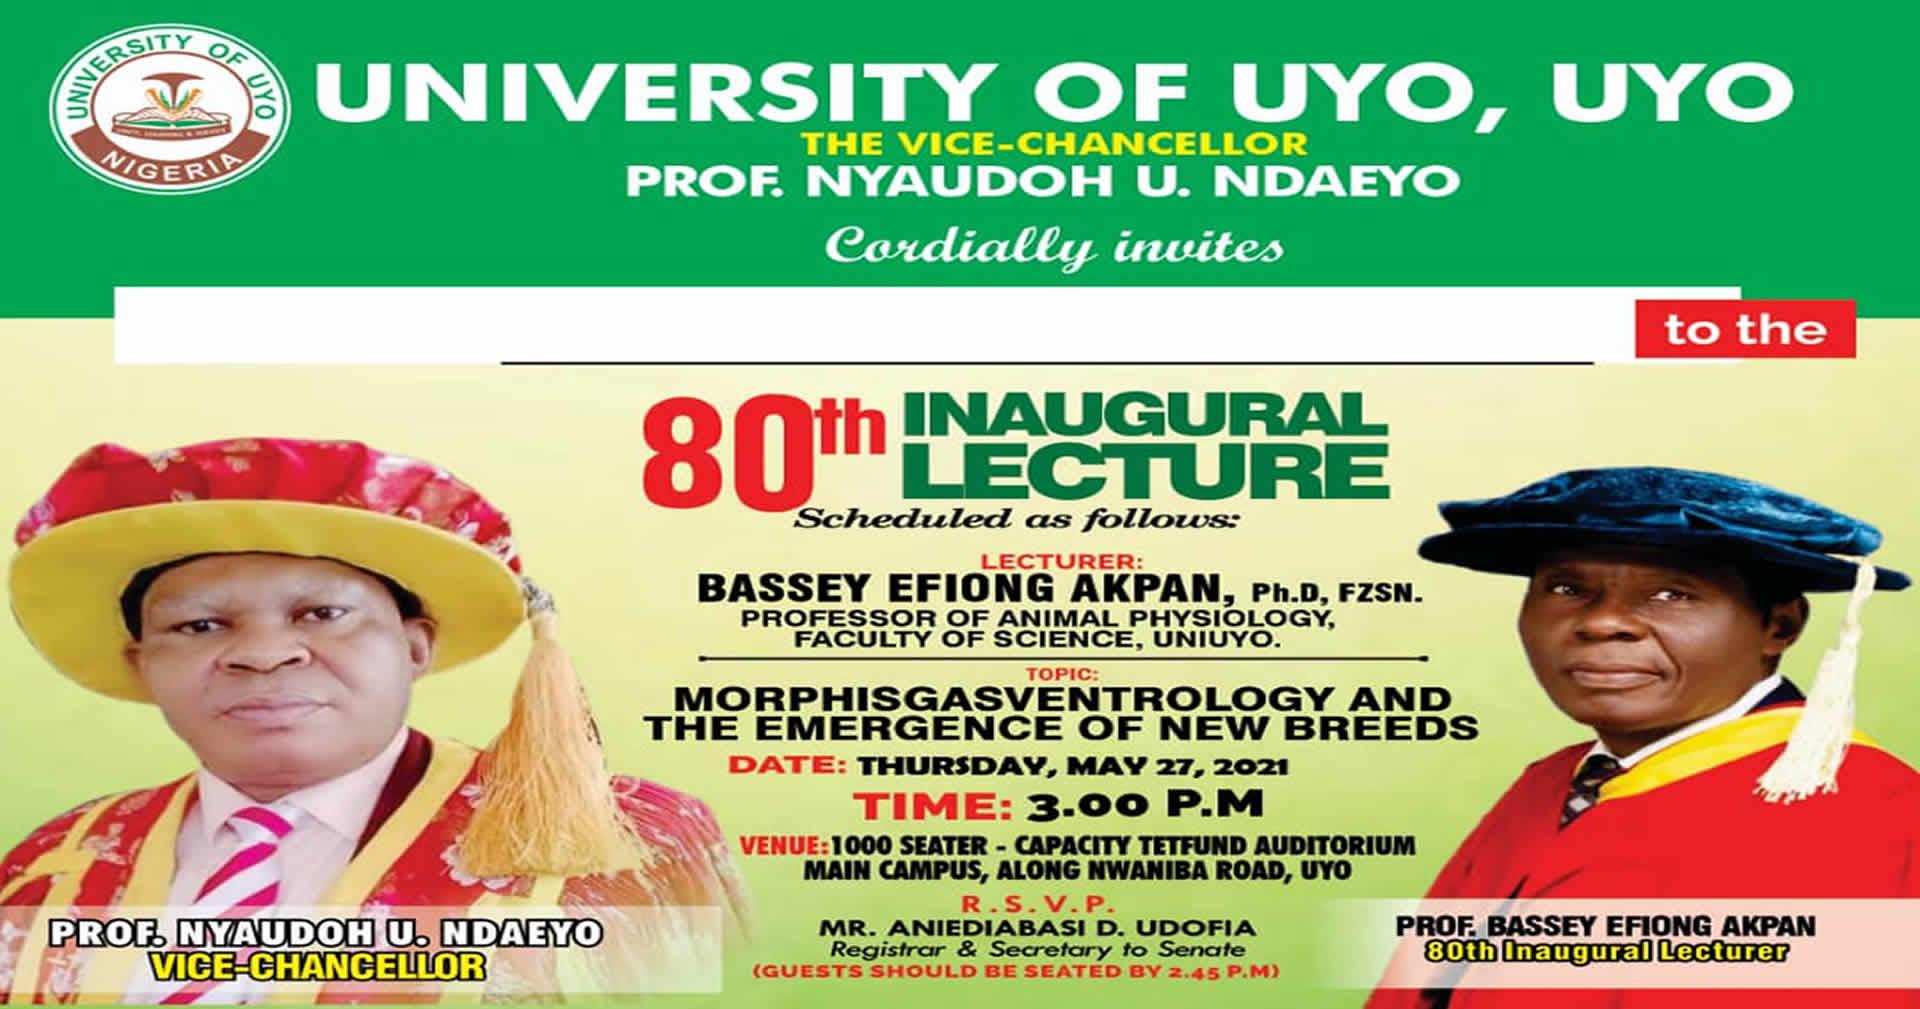 80th Inaugural Lecture